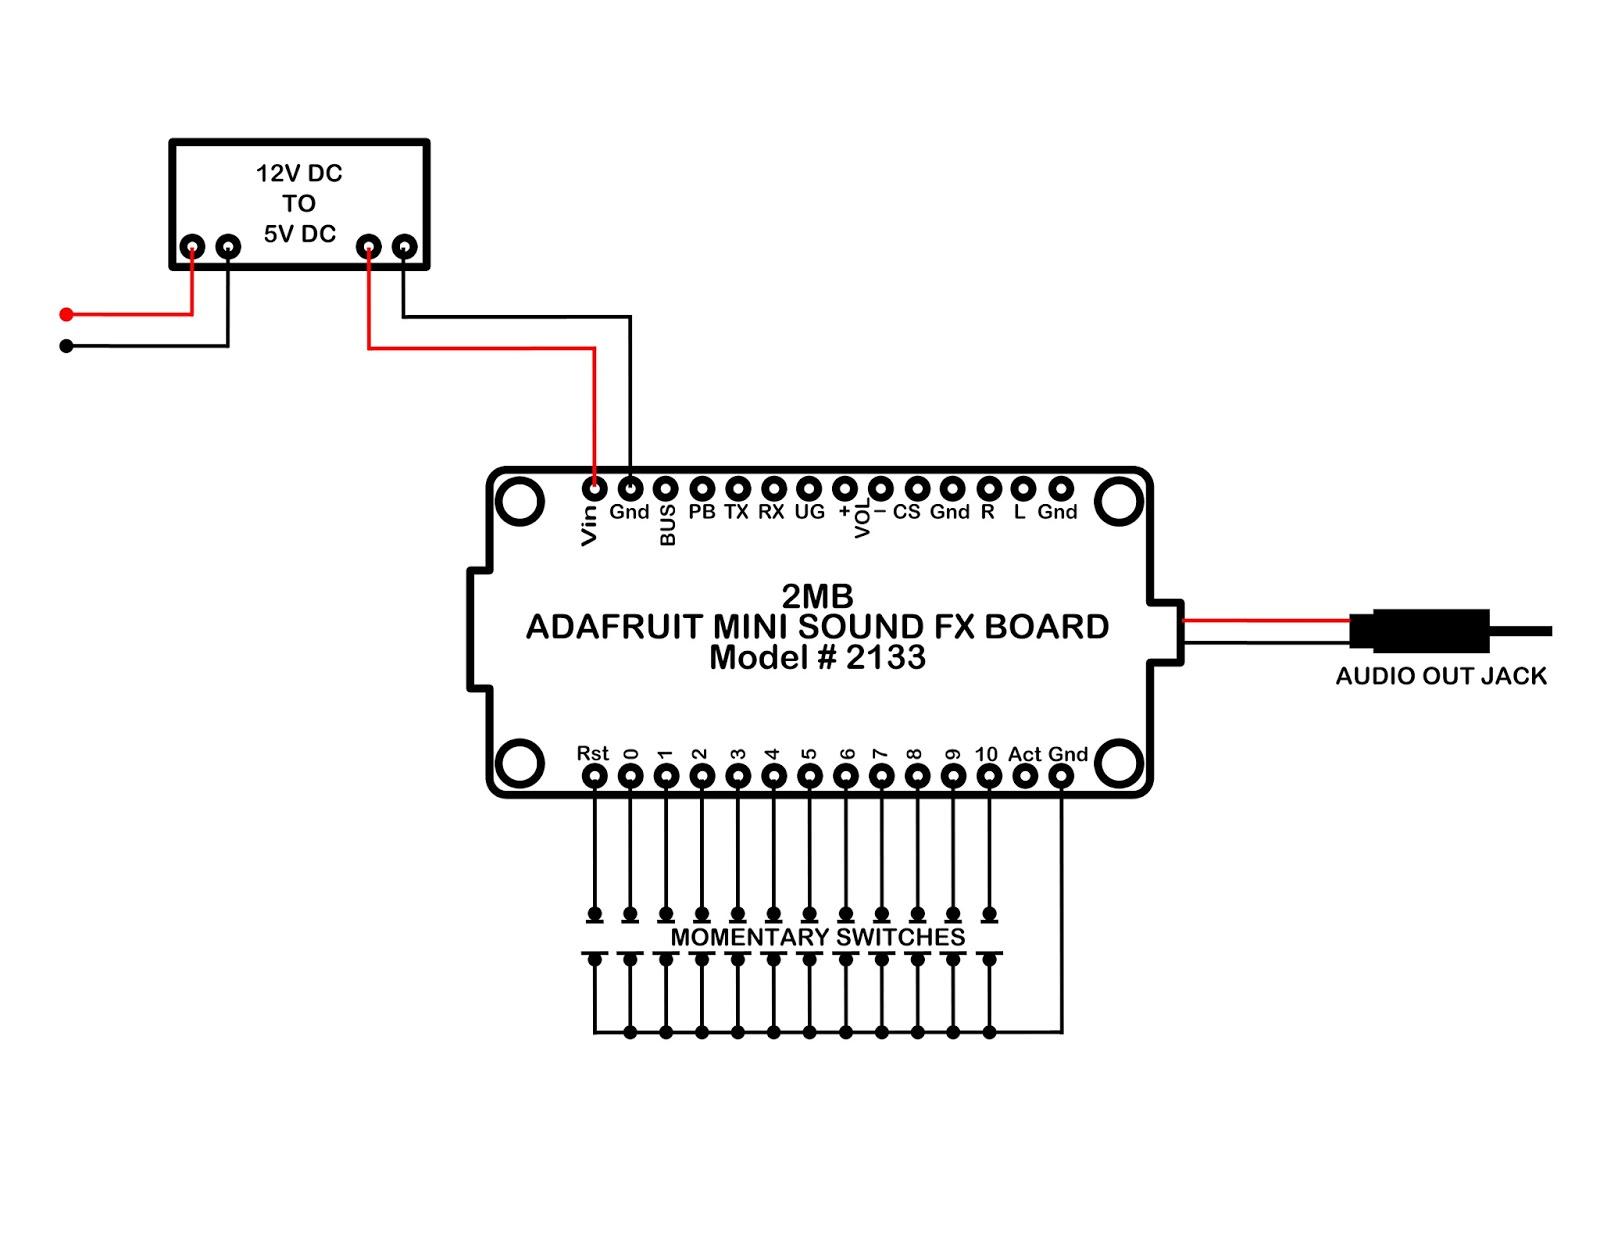 My Knight Rider 2000 Project  Adafruit Mini Sound Fx Board Wiring Diagram